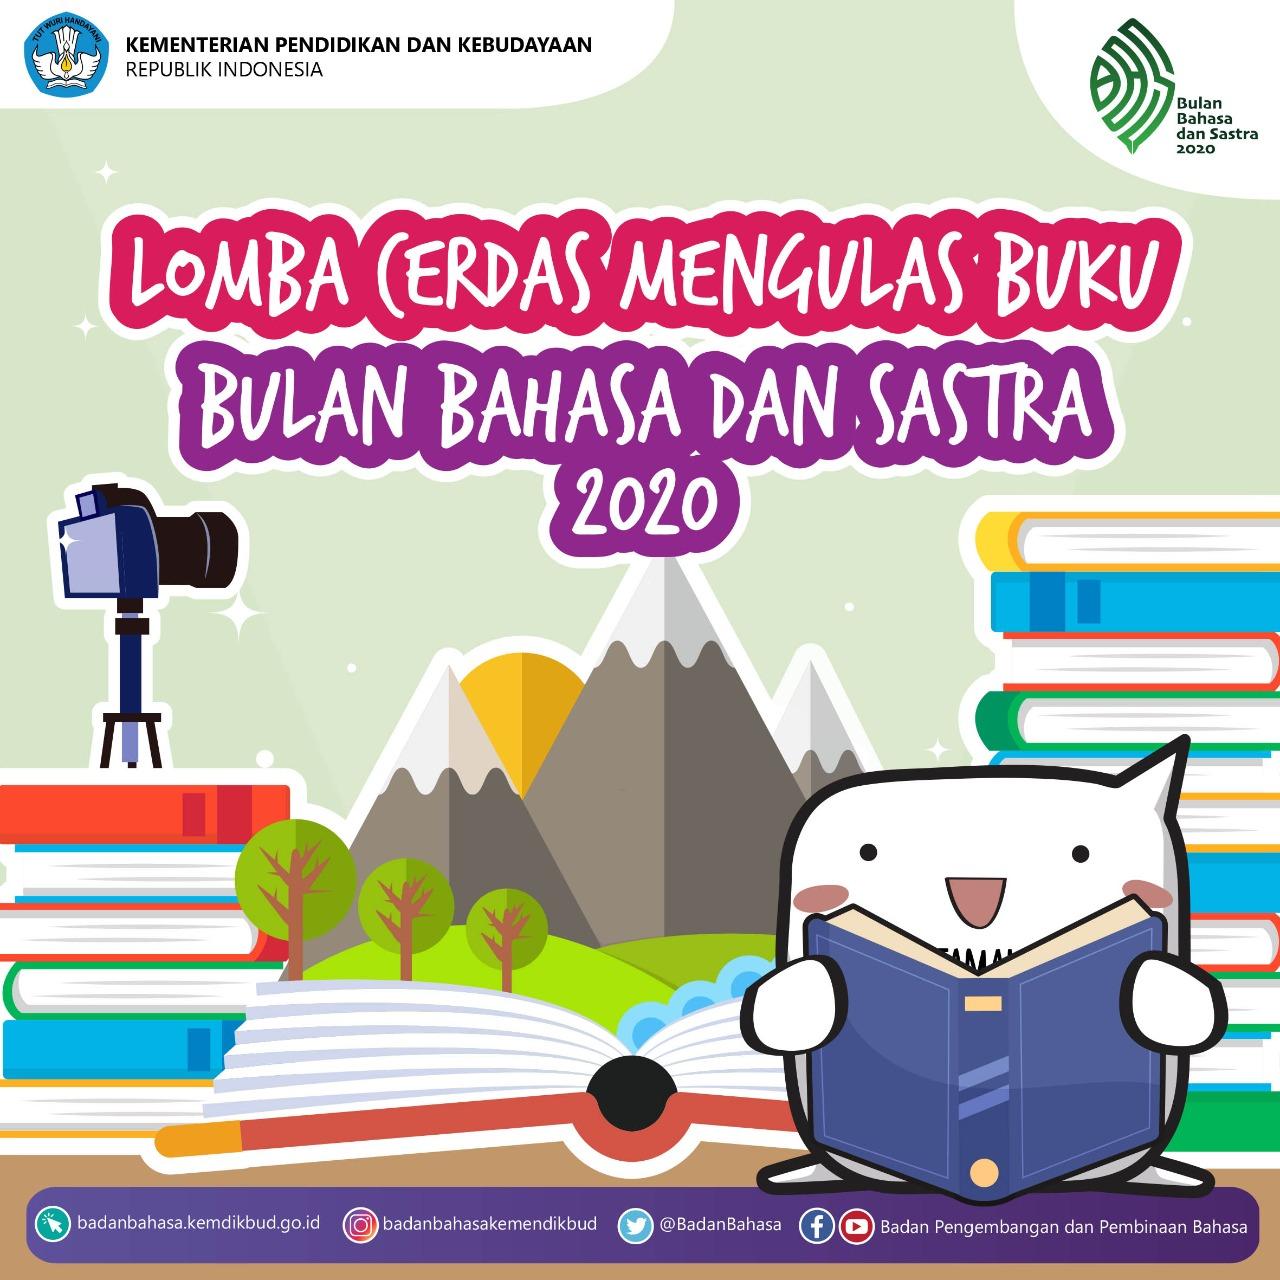 Lomba Cerdas Mengulas Buku untuk Siswa TK PAUD dan SD Kelas Rendah Bulan Bahasa Dan Sastra 2020